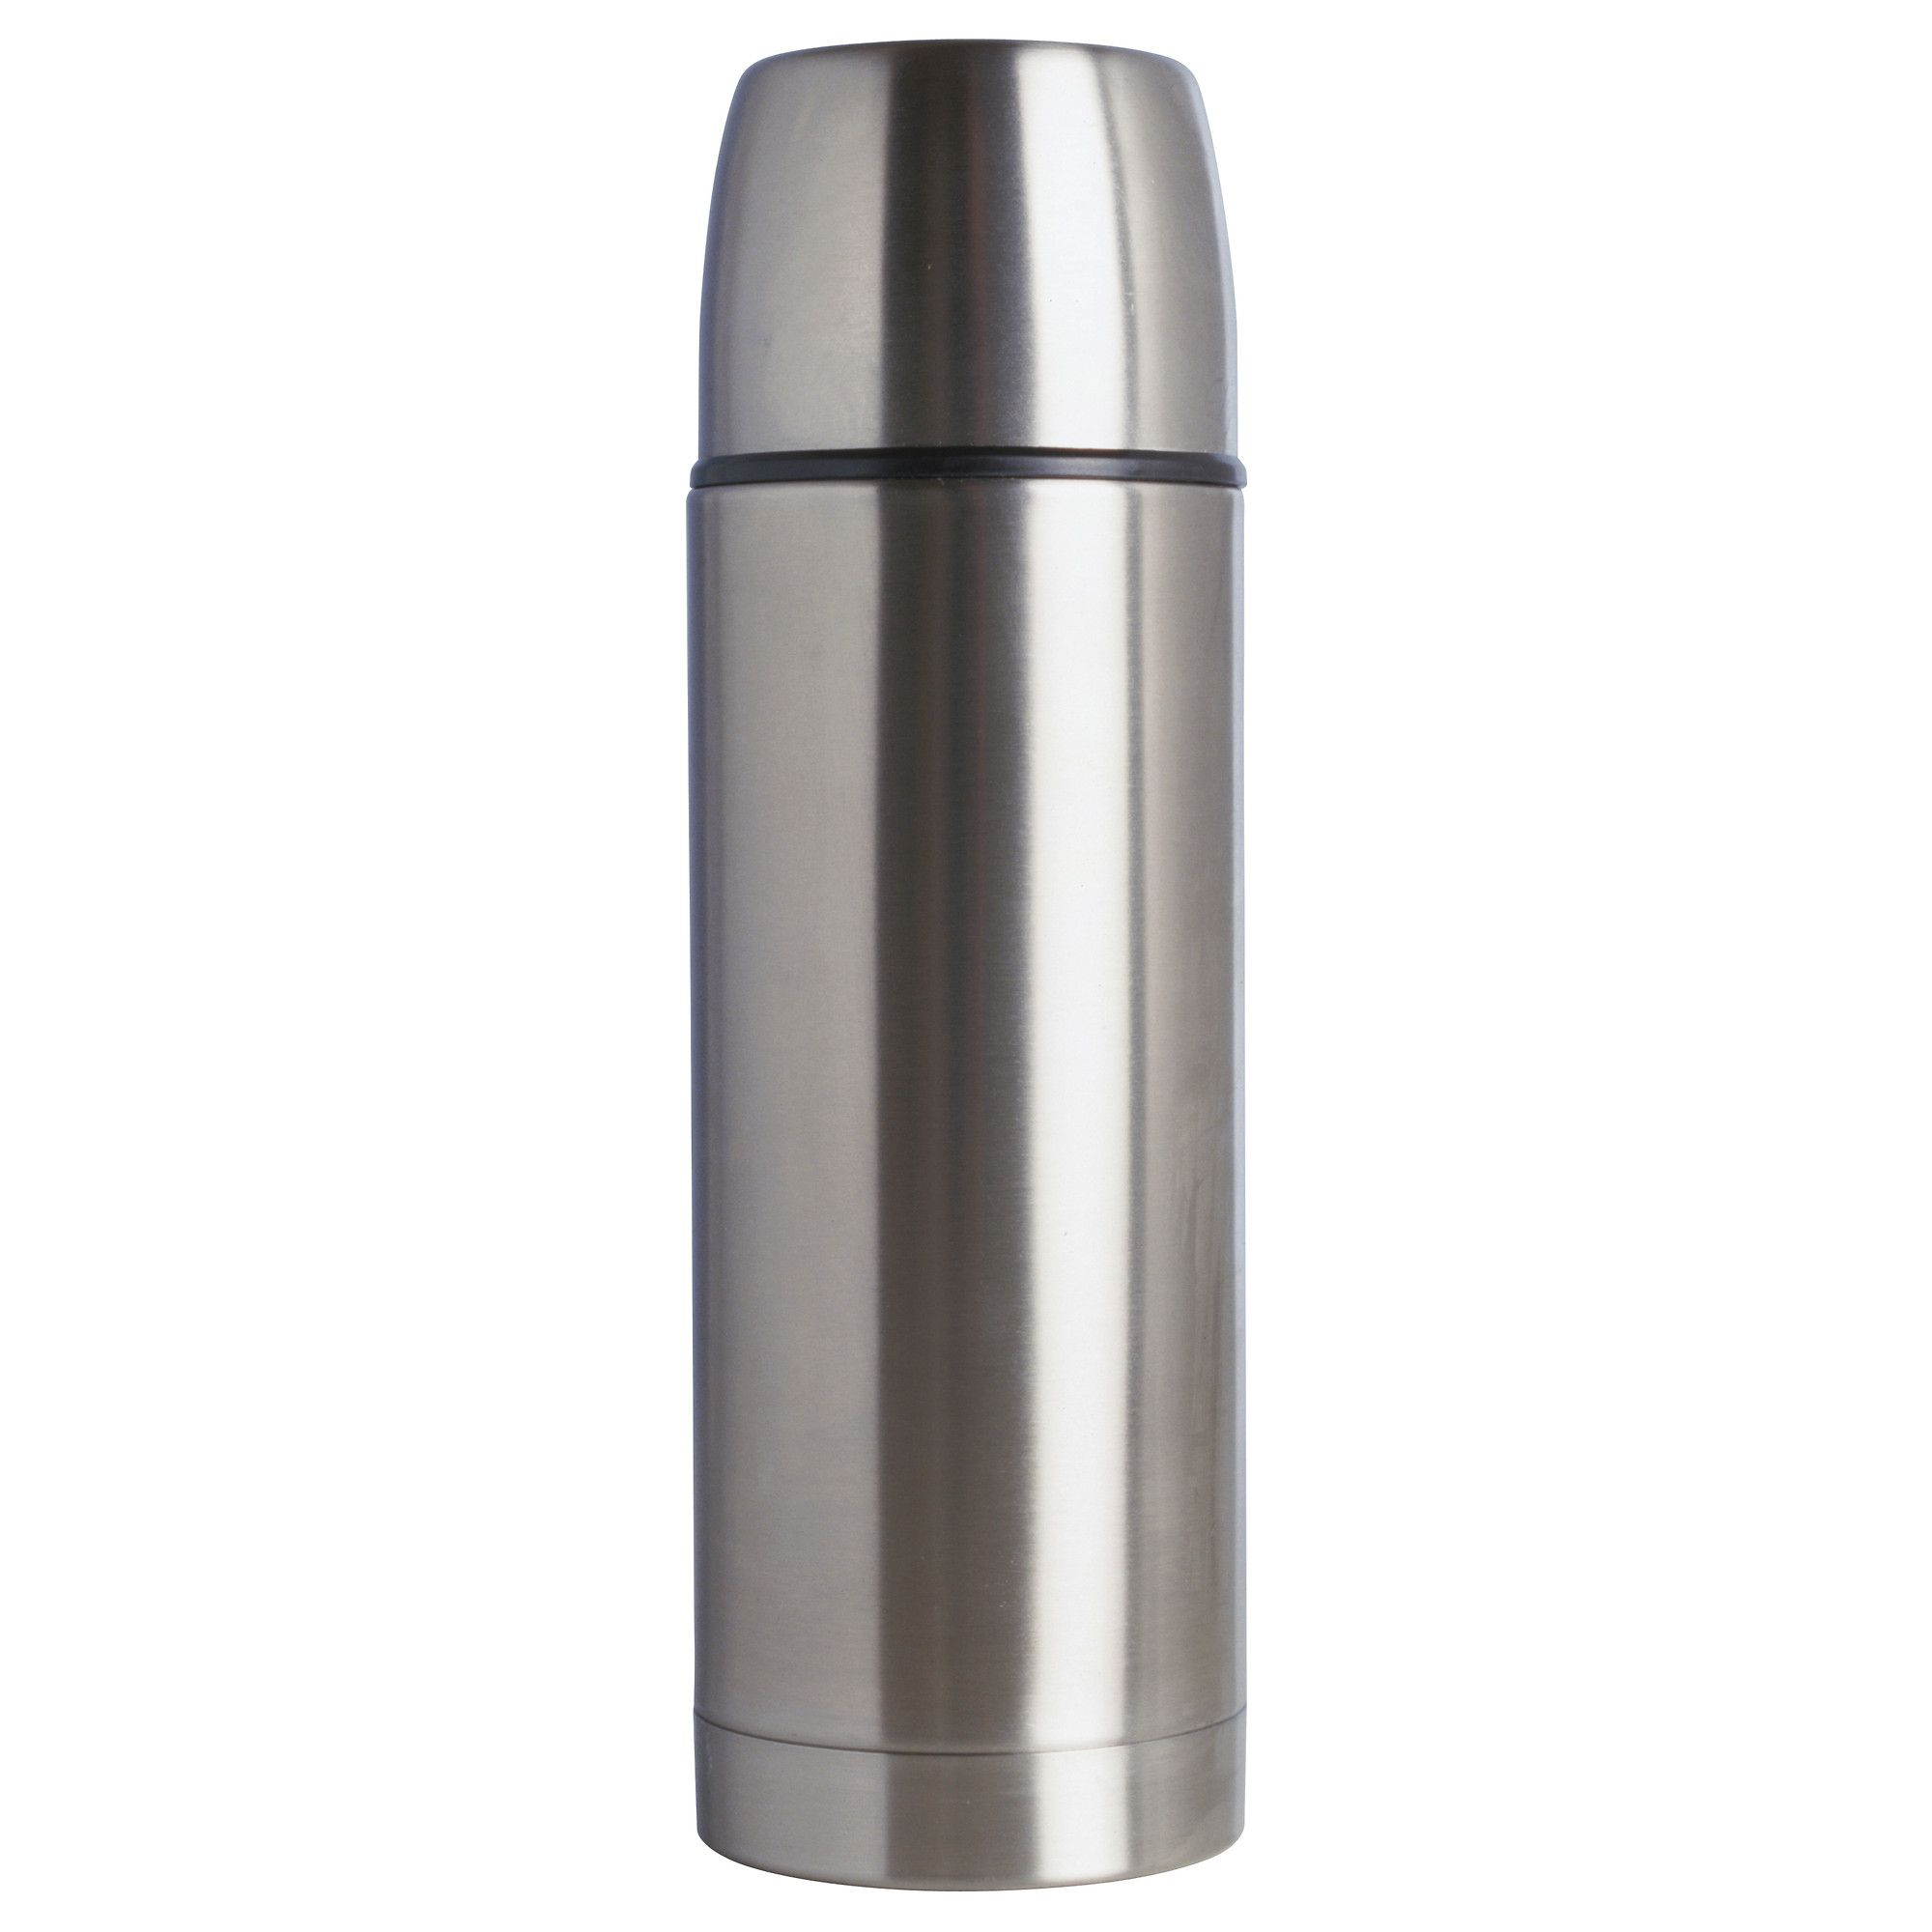 US Furniture and Home Furnishings Vacuum flask, Flask